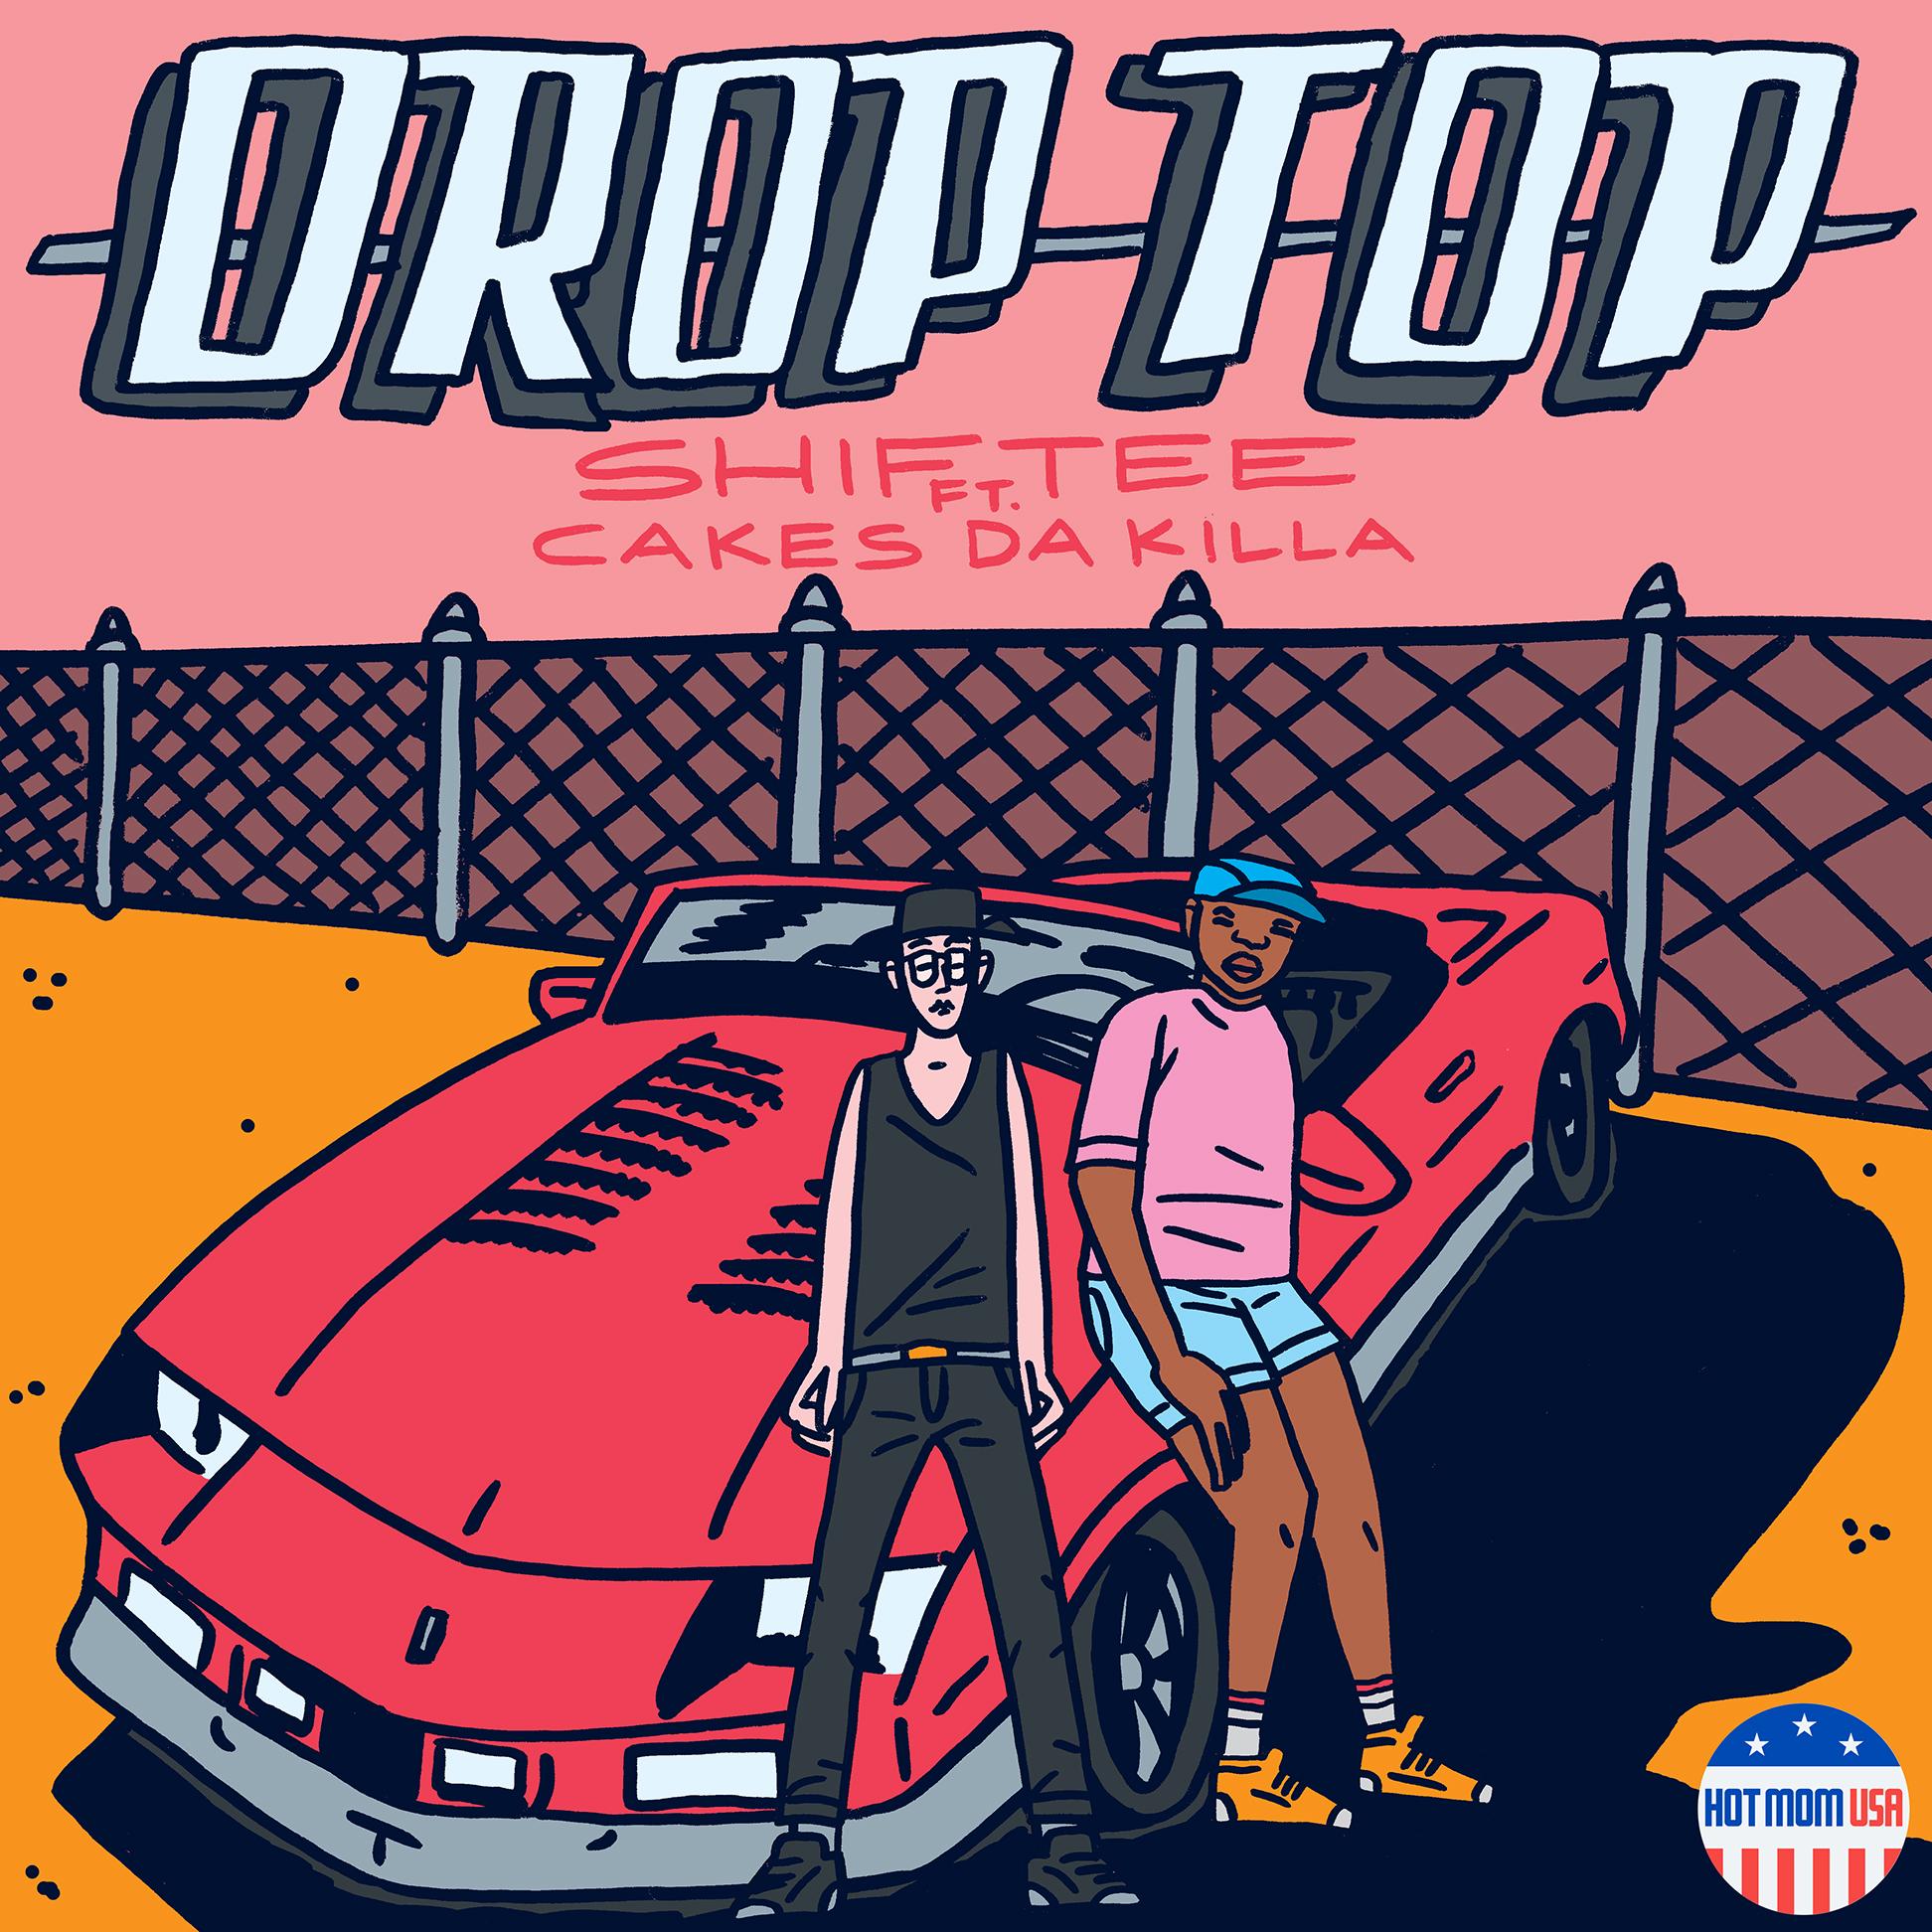 Shiftee - Drop Top ft. Cakes Da Killa